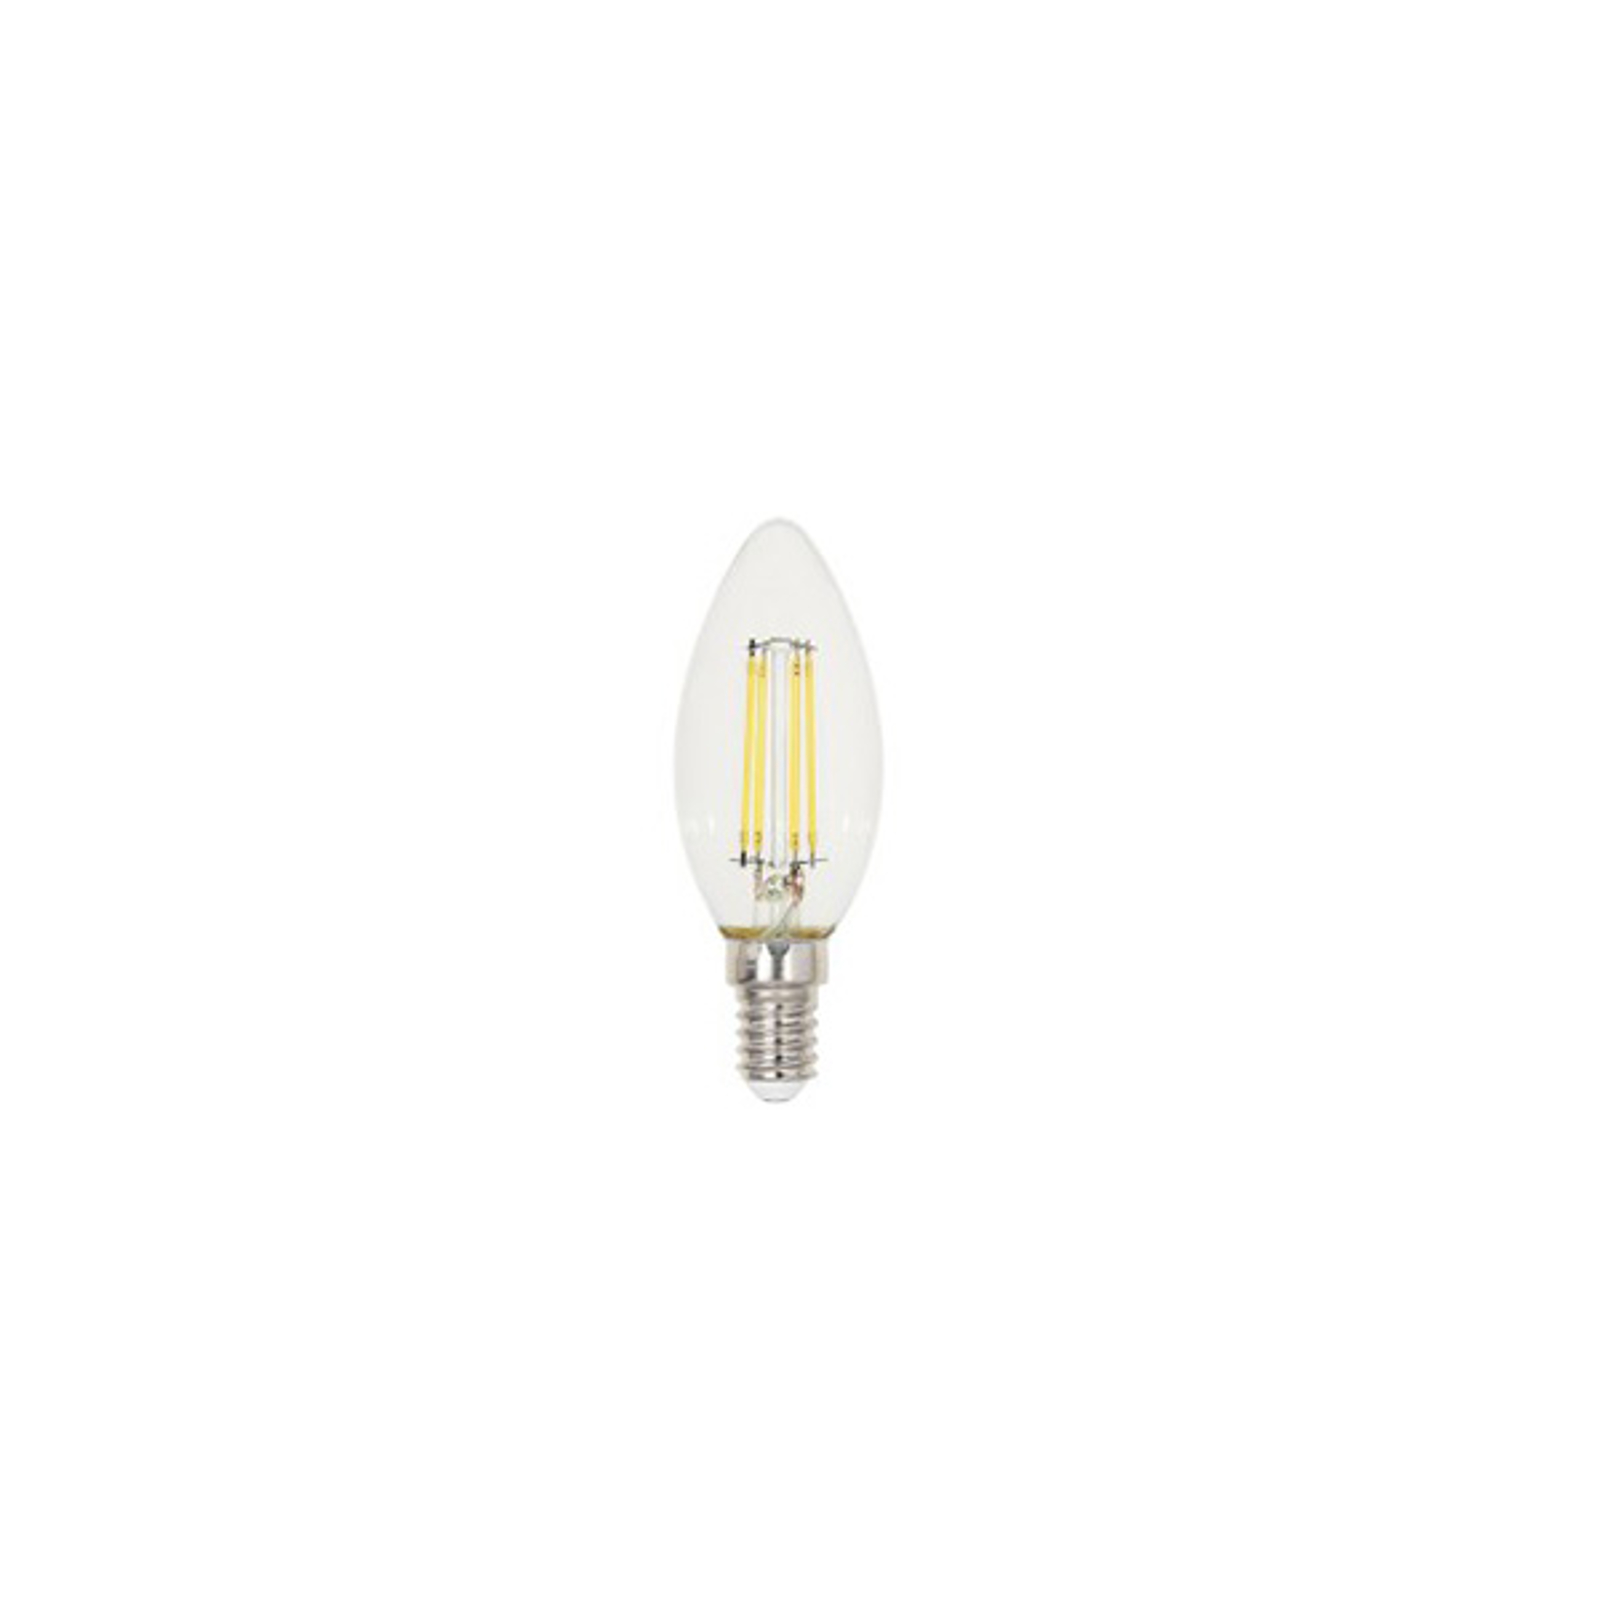 Westinghouse lampadina LED E14 4,5W 2.700K dimming